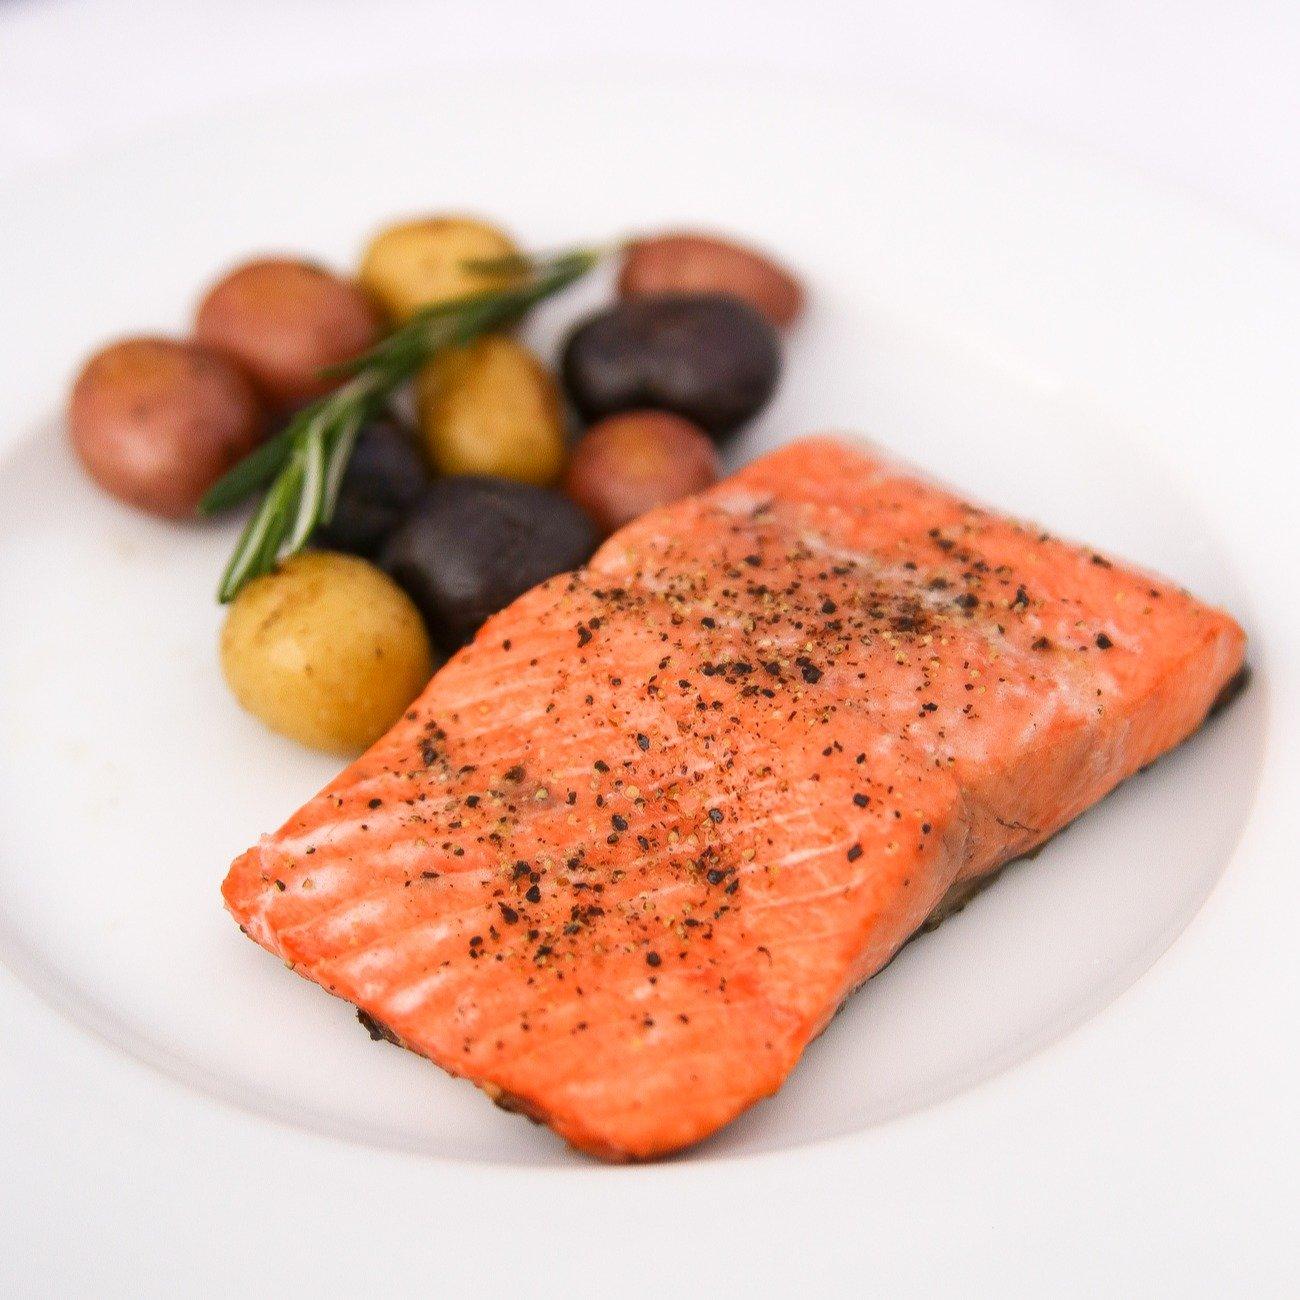 sockeye-salmon-portions